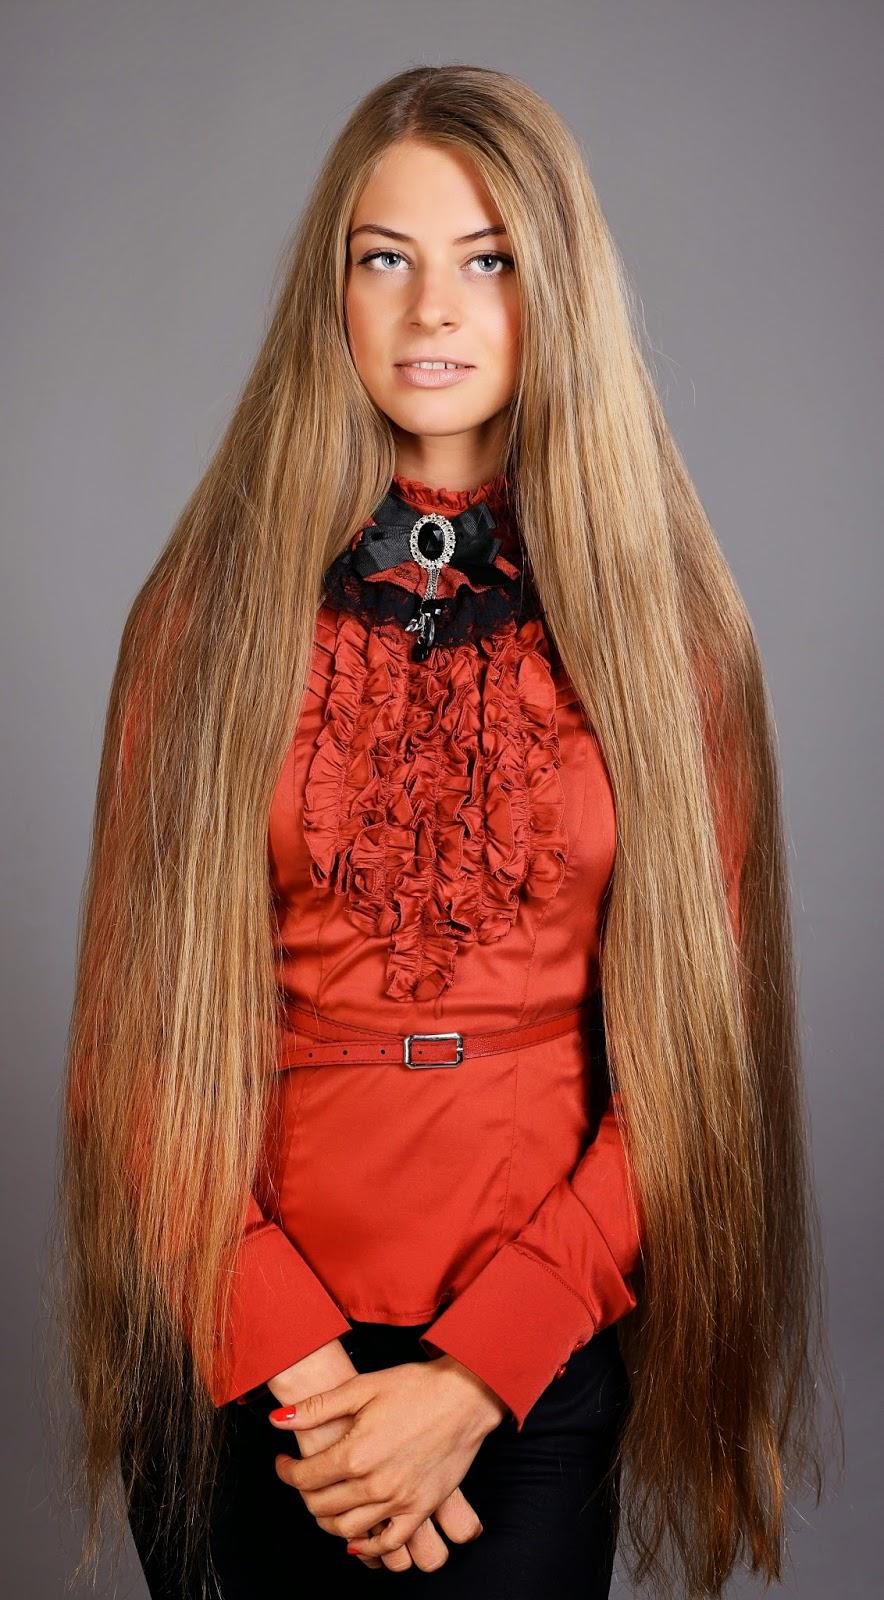 Long hair hair hairjob - 1 4